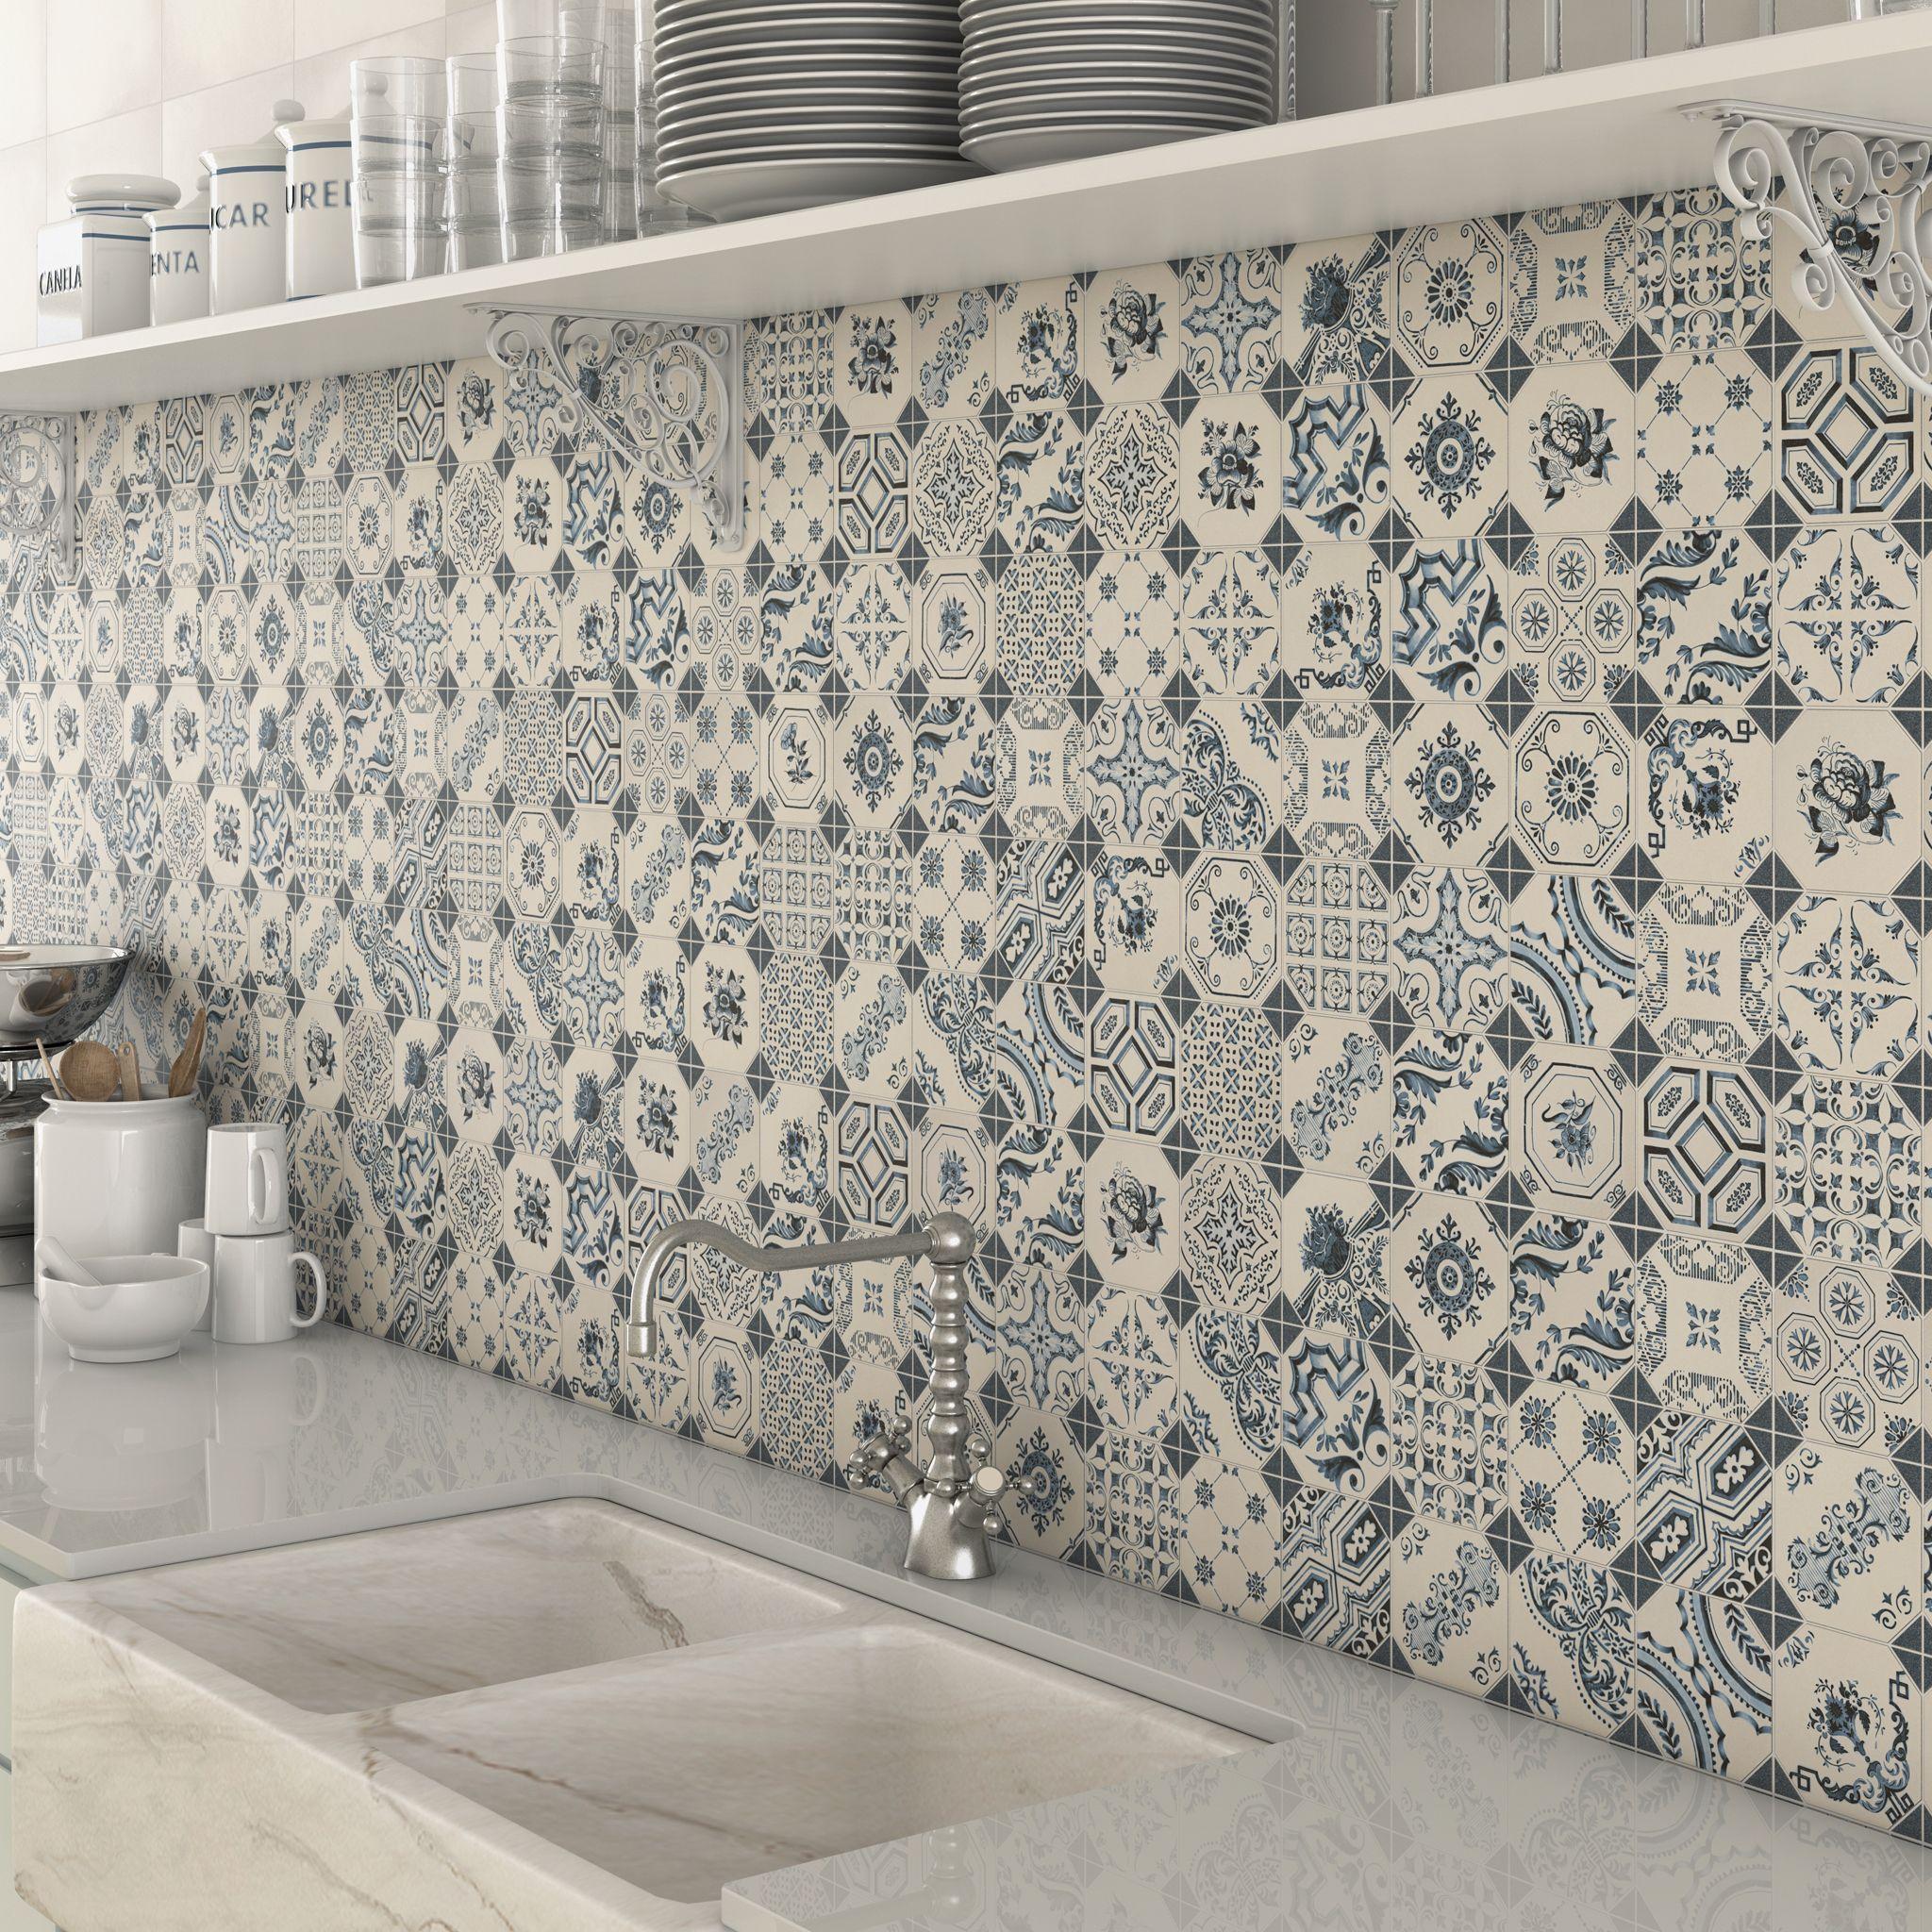 Bologna Blue Pattern Mosaic Tiles Used As A Splashback Tile In